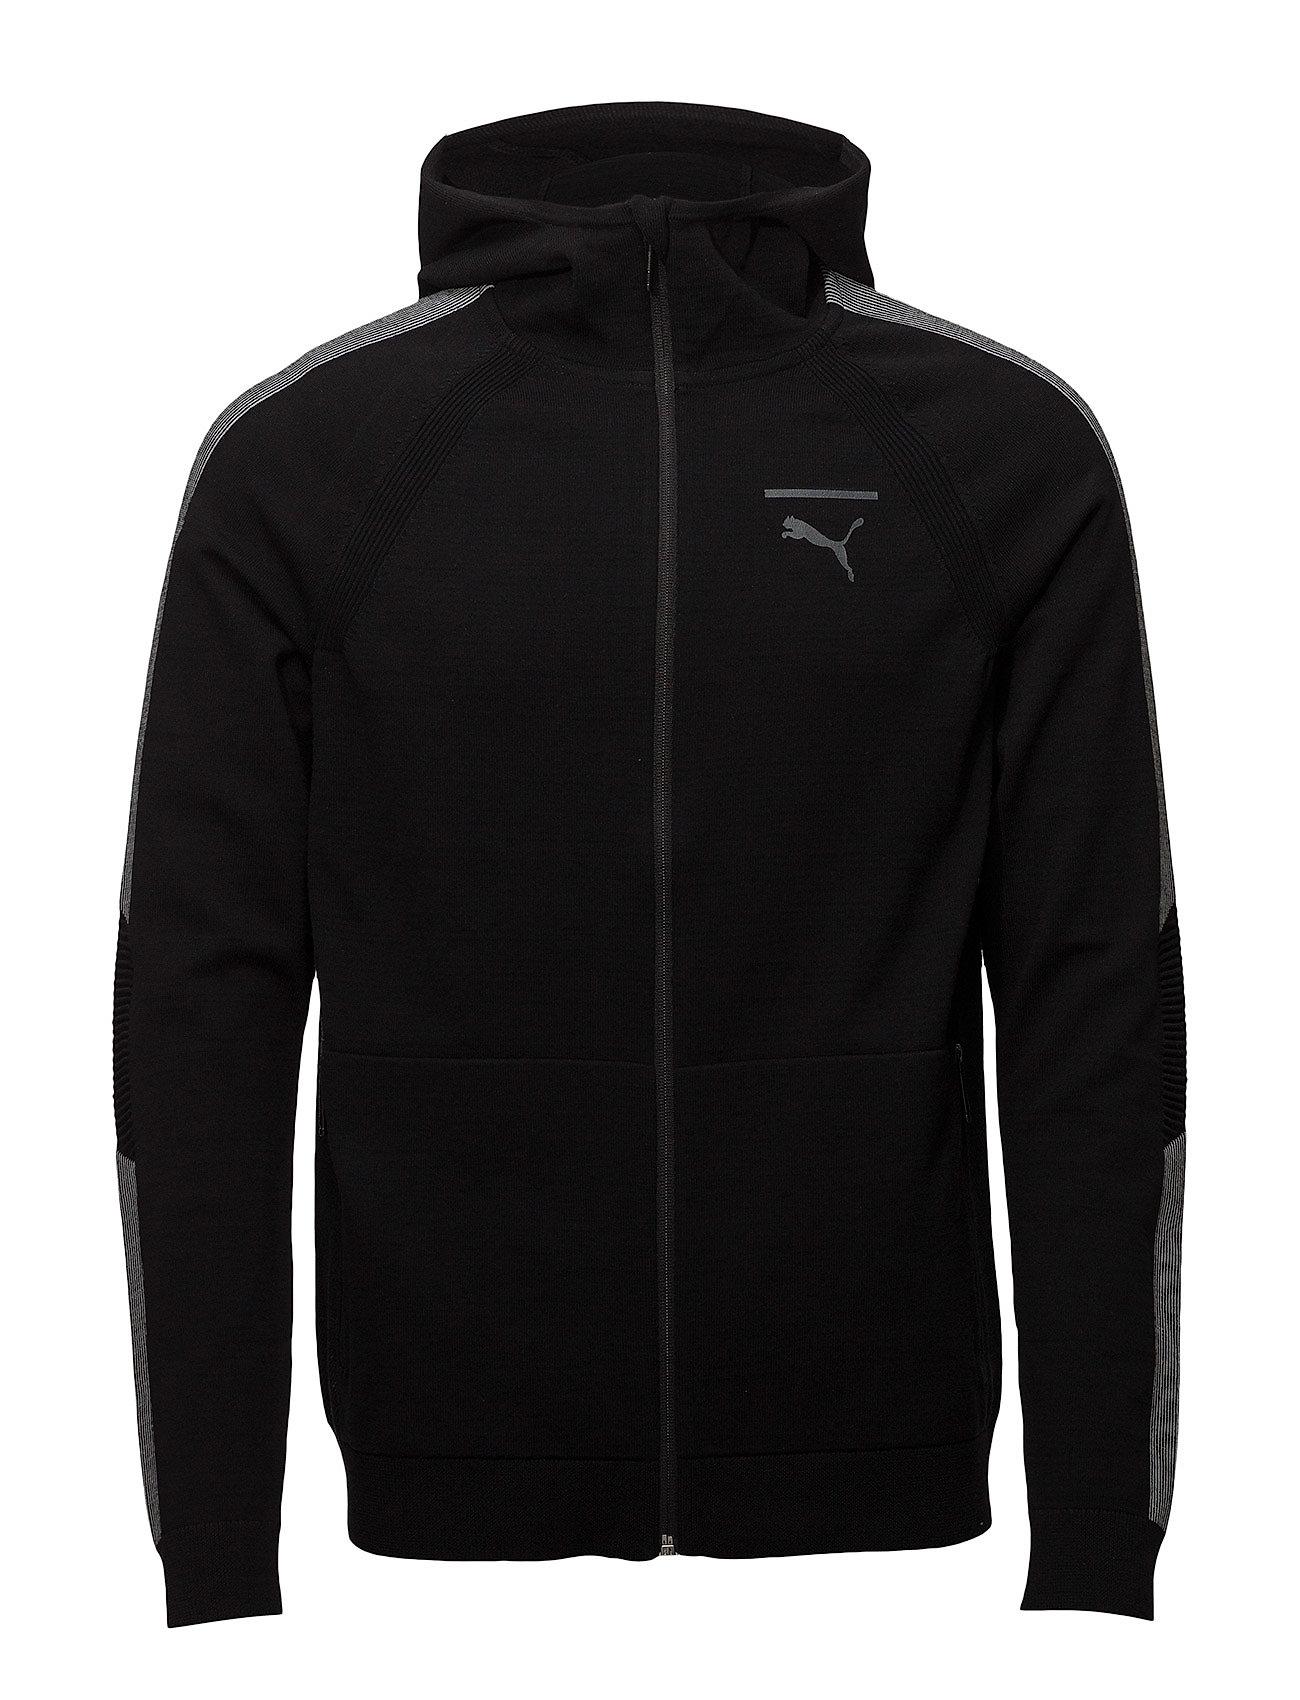 Sweatshirt & Hoodie im Sale - Pace Evoknit Move Fz Hoody